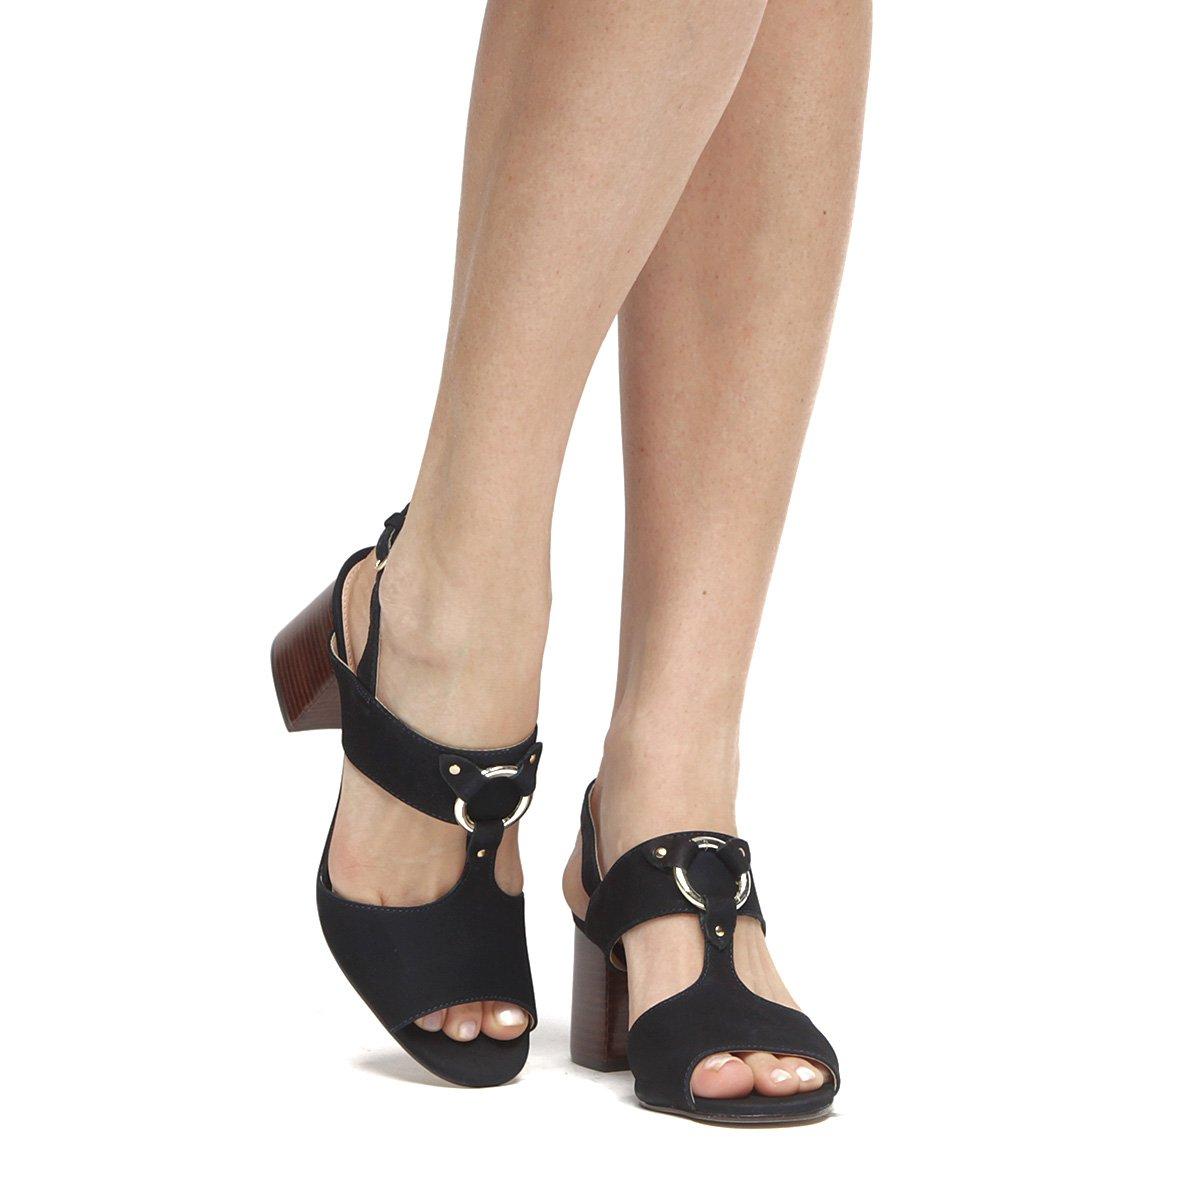 8662536cfb Sandália Couro Shoestock Salto Grosso Argola Feminina